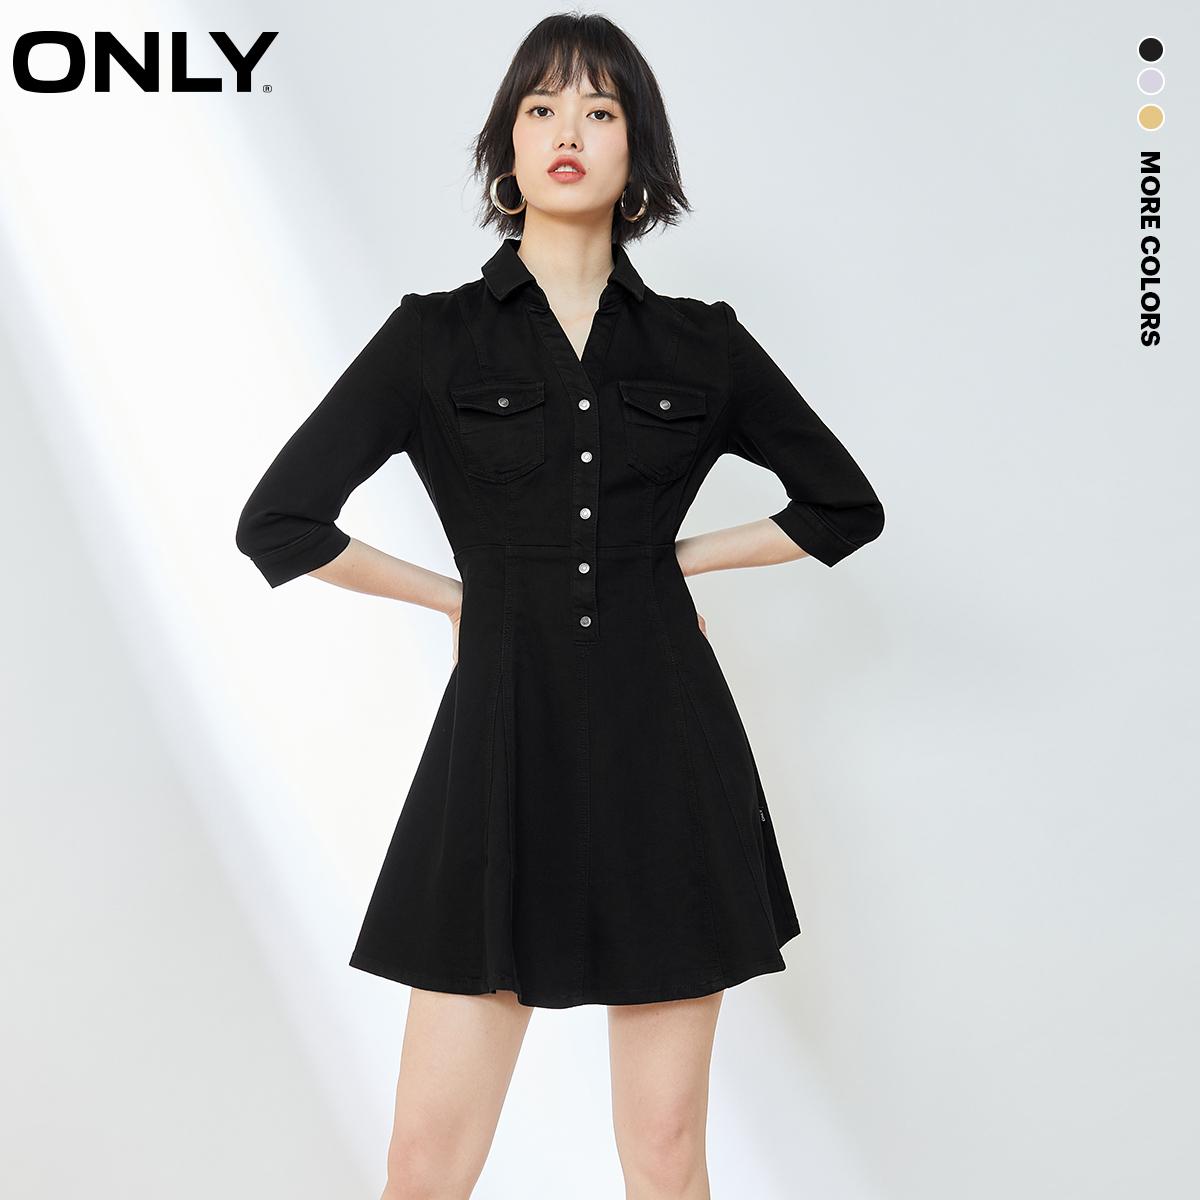 ONLY春季新款时尚金属纽扣A字显瘦牛仔连衣裙女|120242517